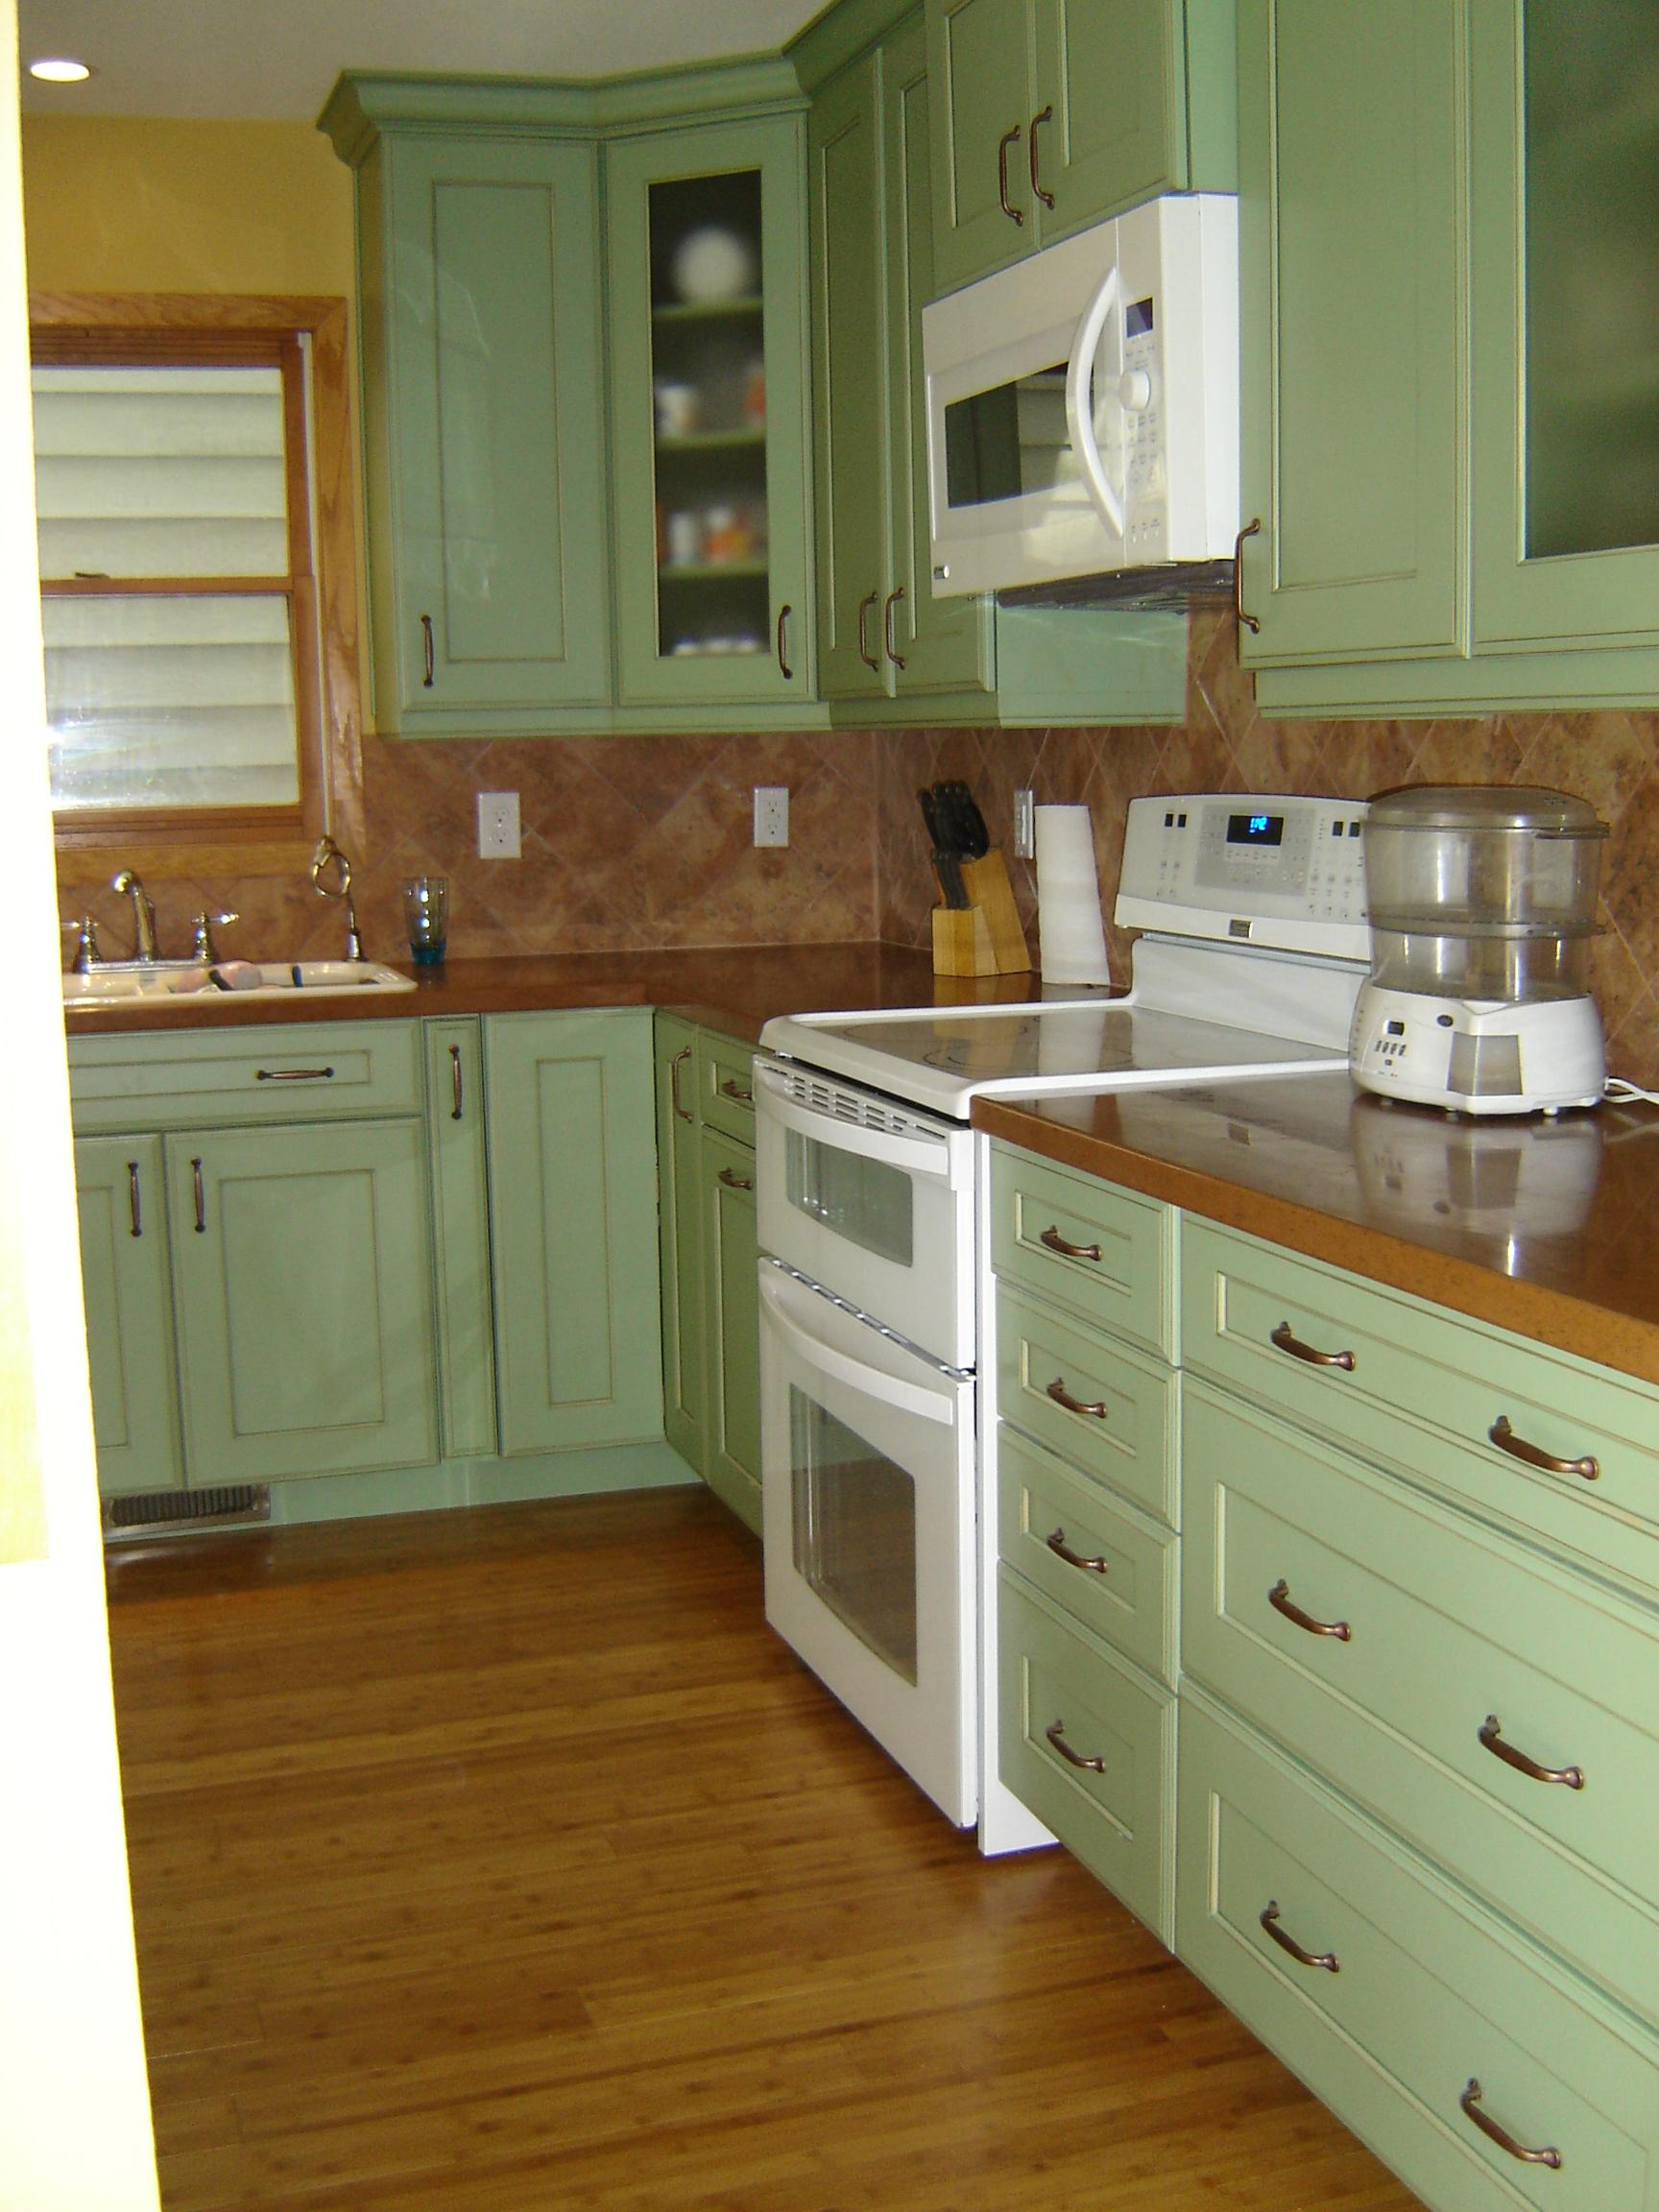 martin daniel kitchen remodel boulder schuster design studio kitchens design omaha home